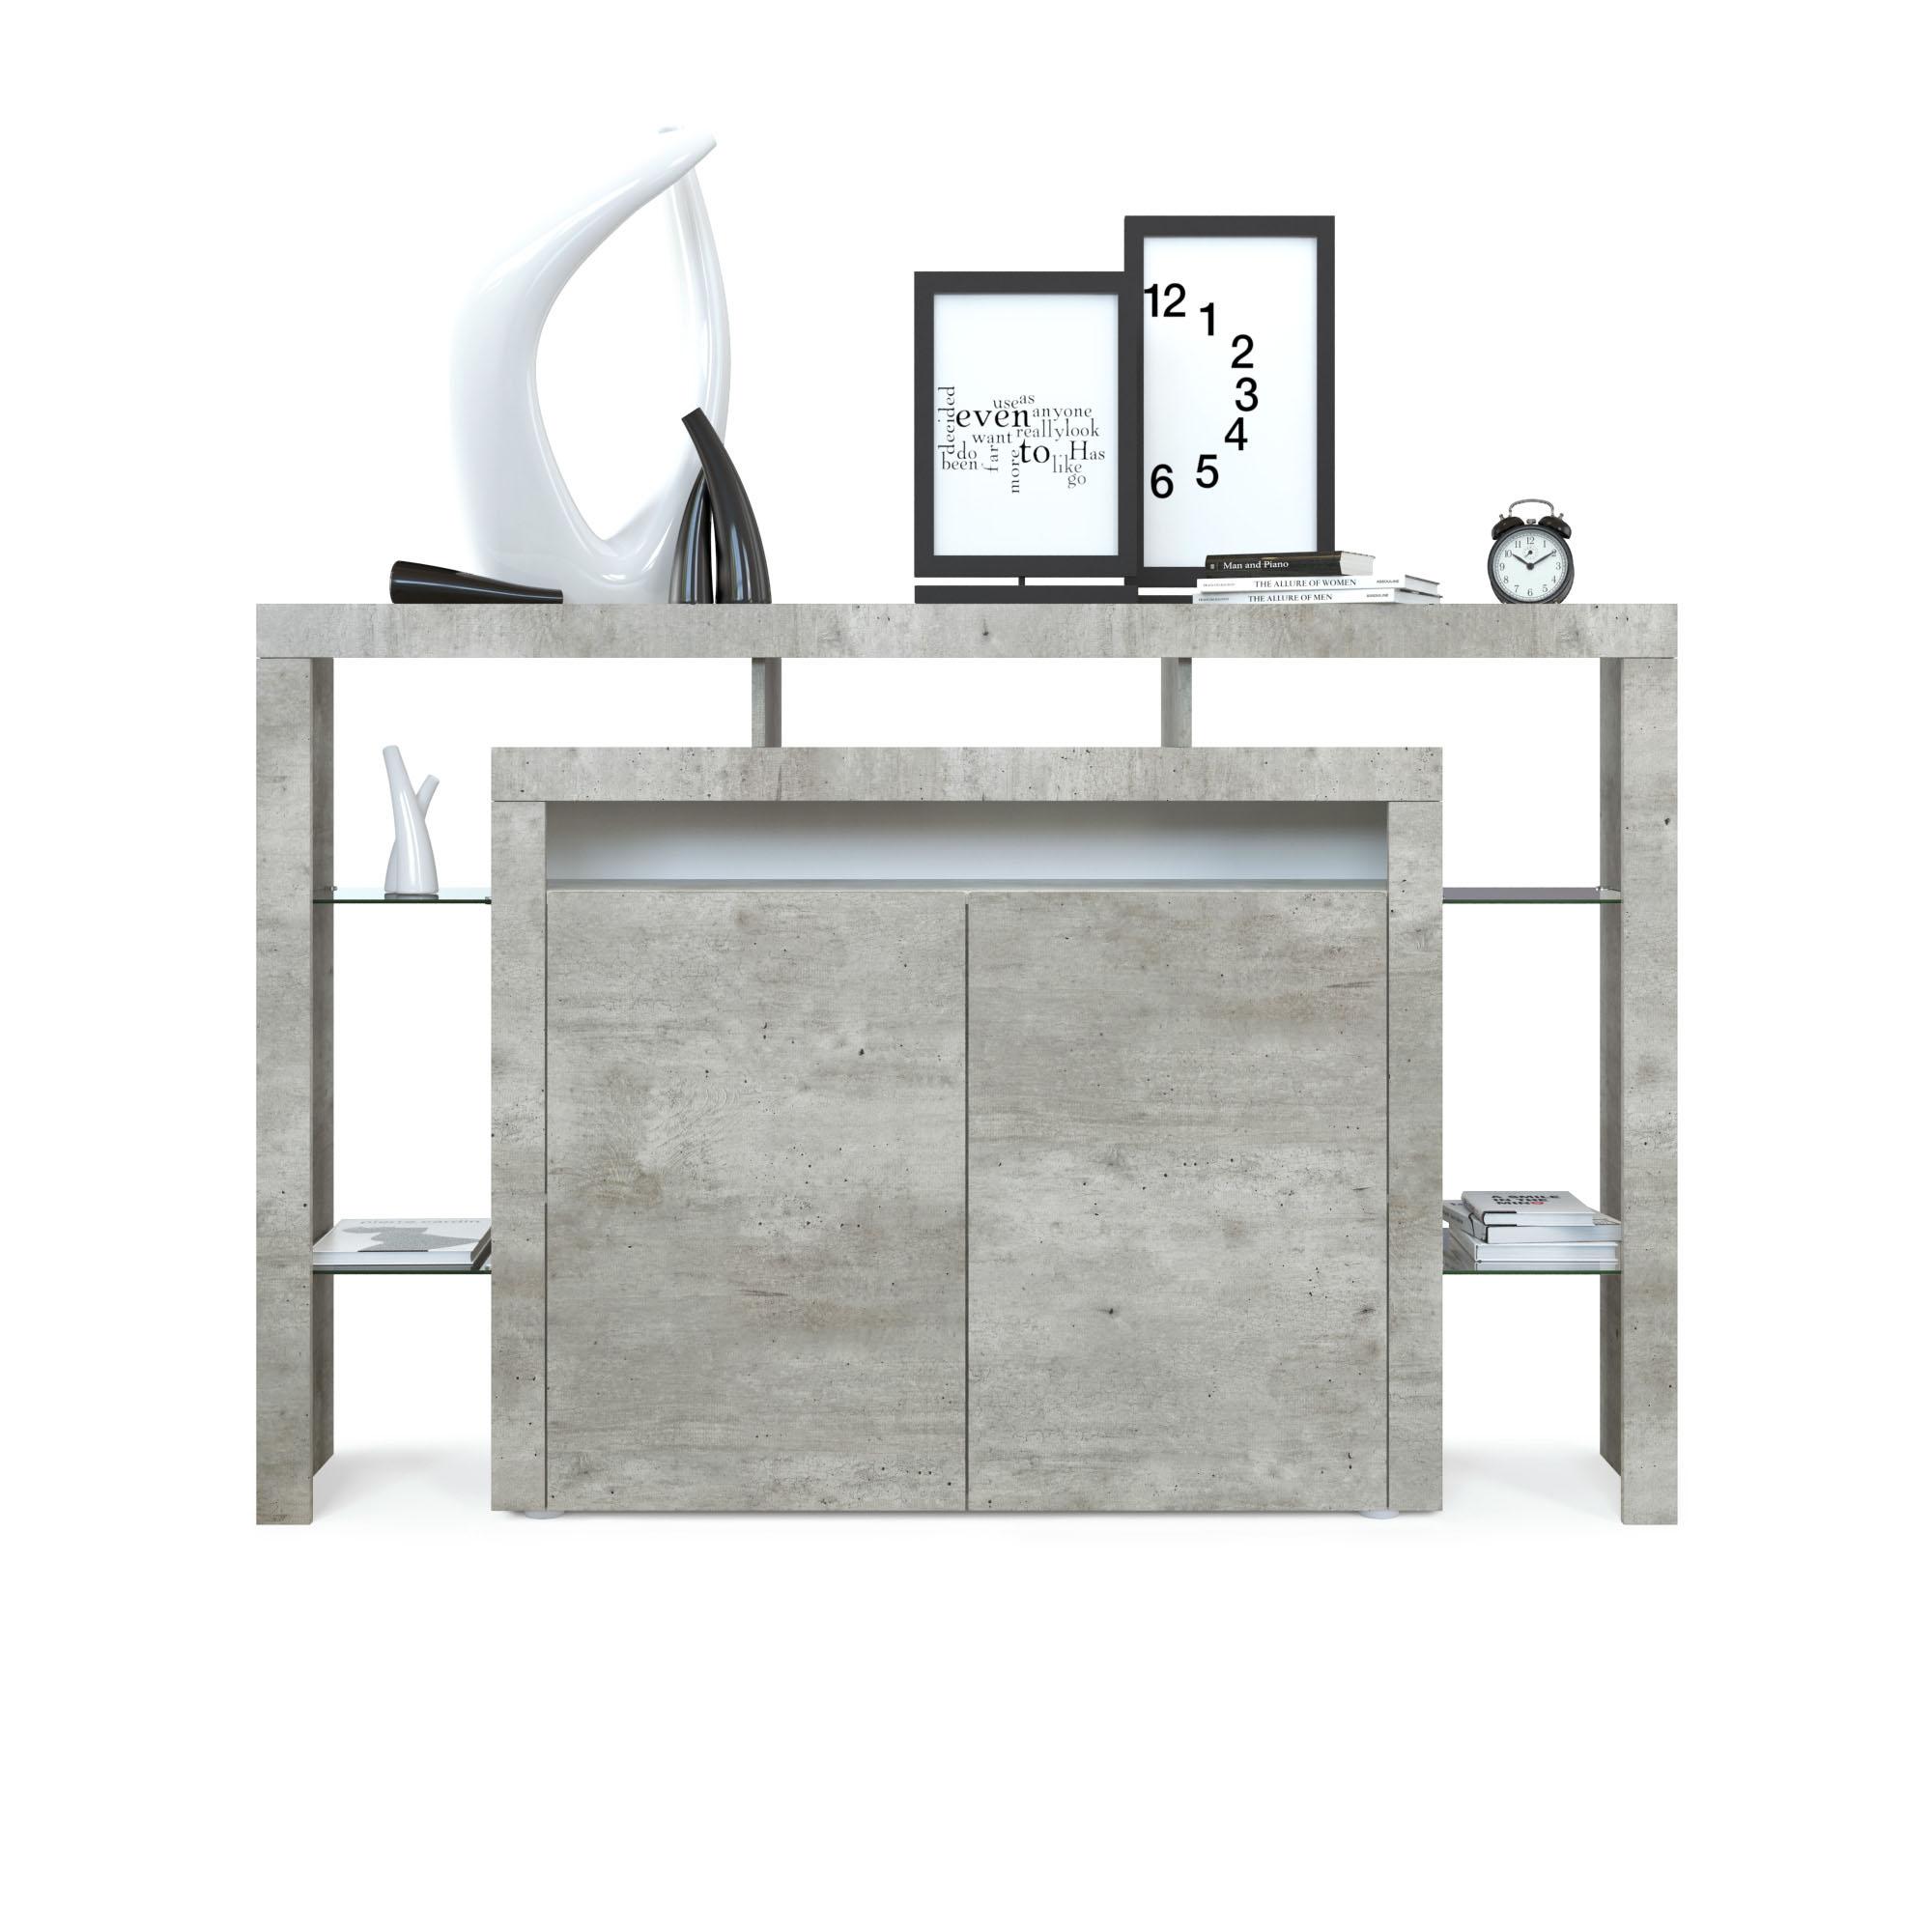 highboard sideboard kommode hochglanz rosario 160 wei schwarz beton ebay. Black Bedroom Furniture Sets. Home Design Ideas